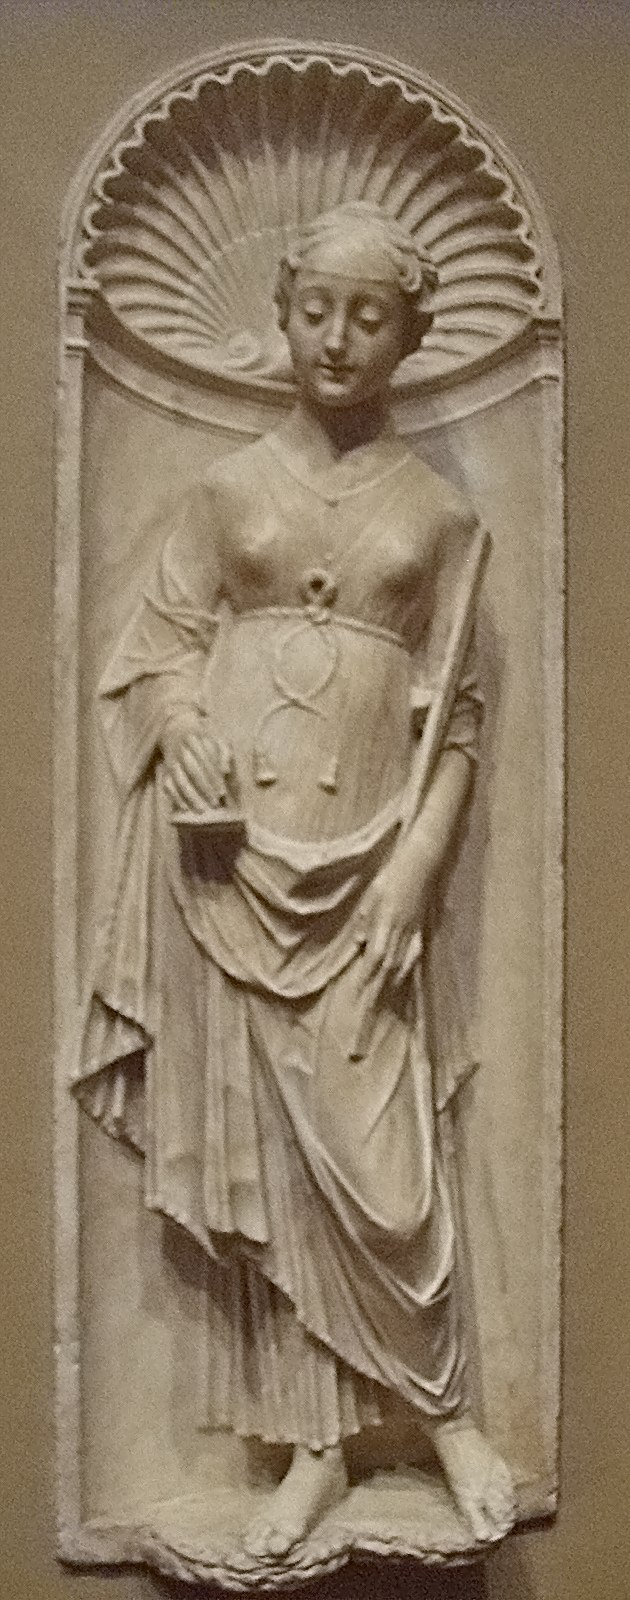 National gallery in washington d.c., mino da fiesole, fede, 1475-1480